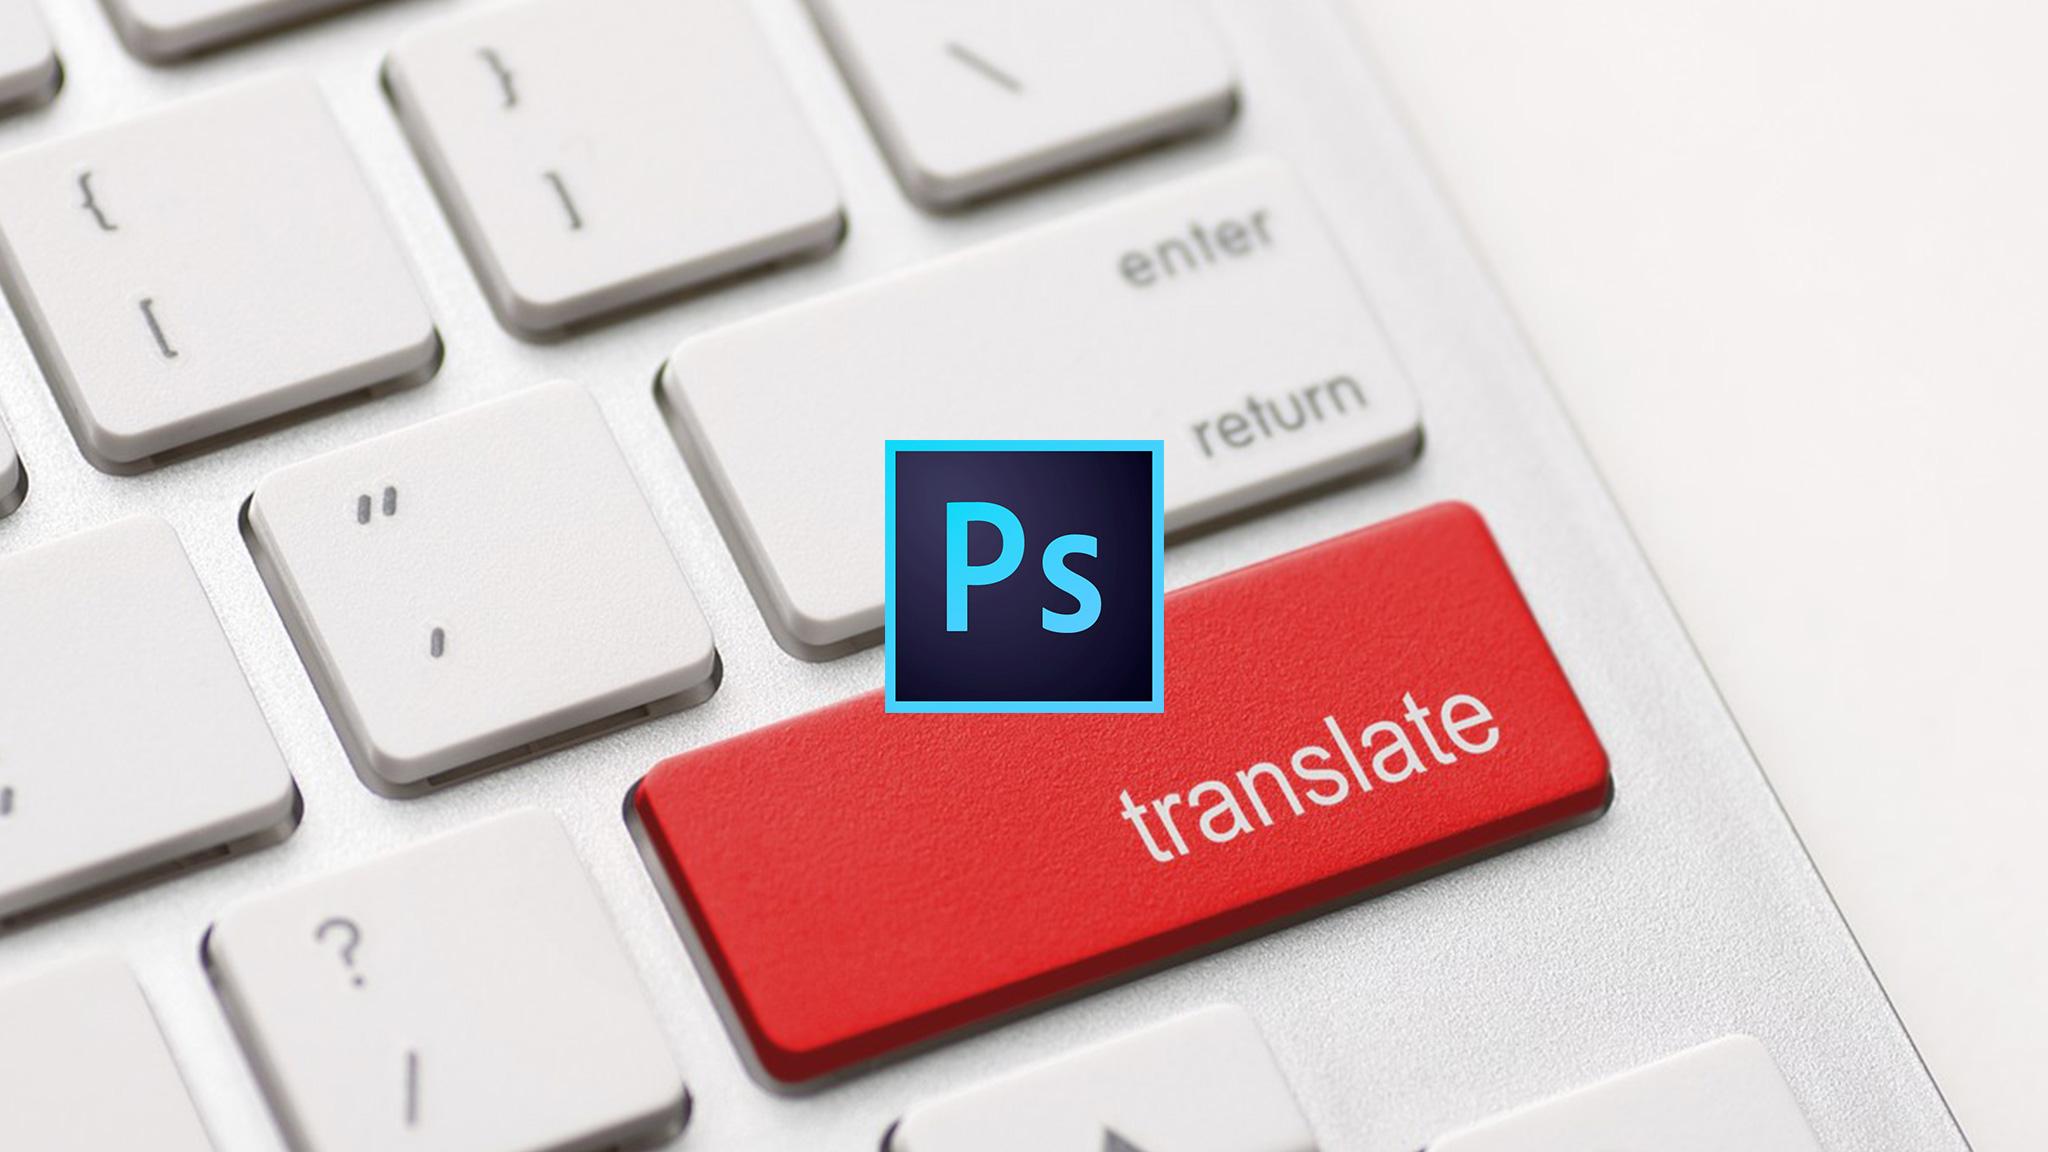 Traduction Françaisanglais Raccourcis Clavier De Photoshop